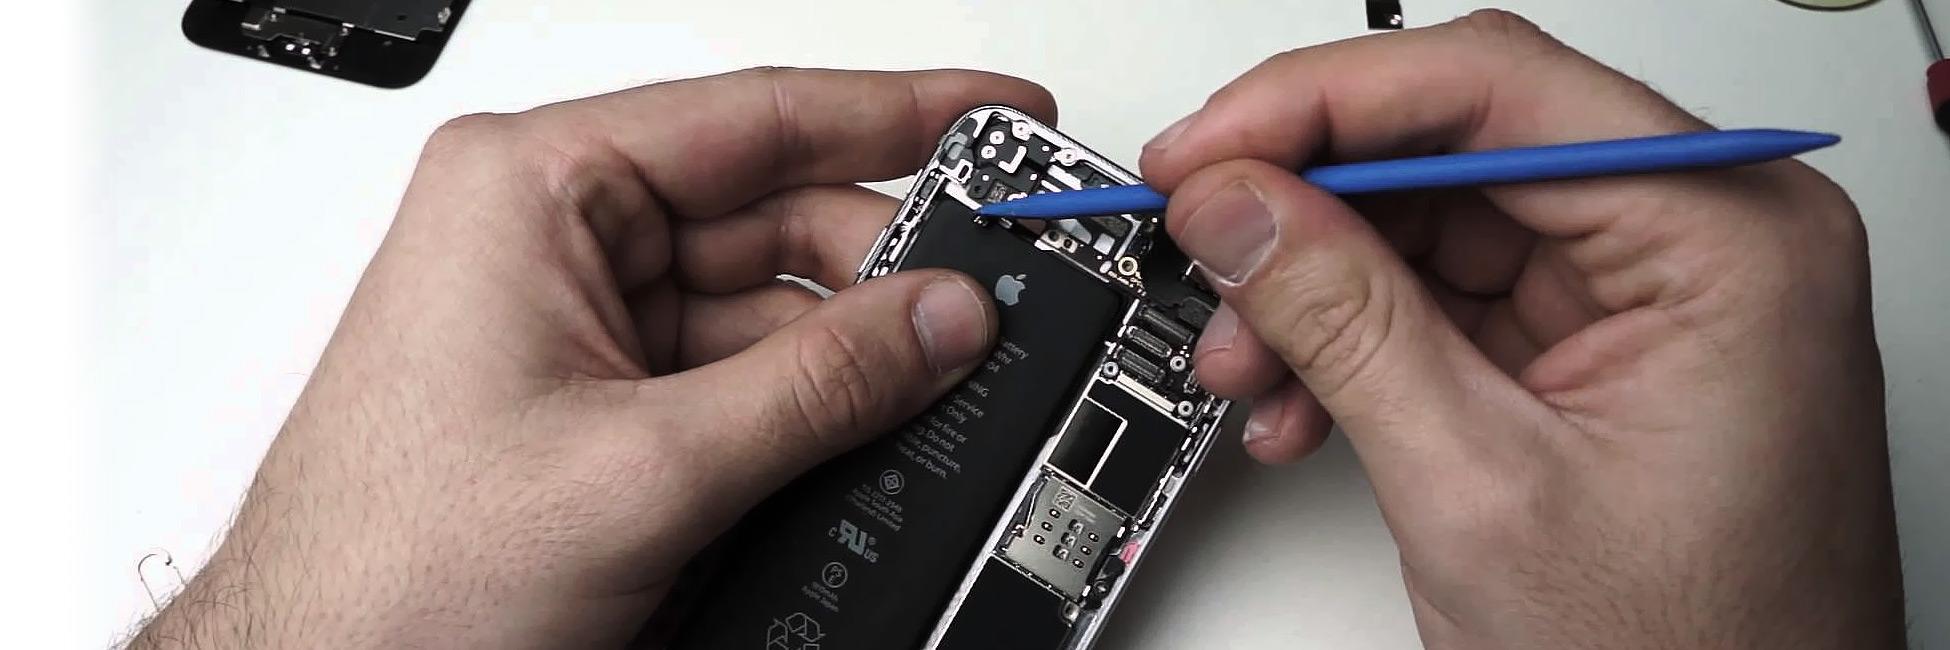 تعمیر اپل آیفون